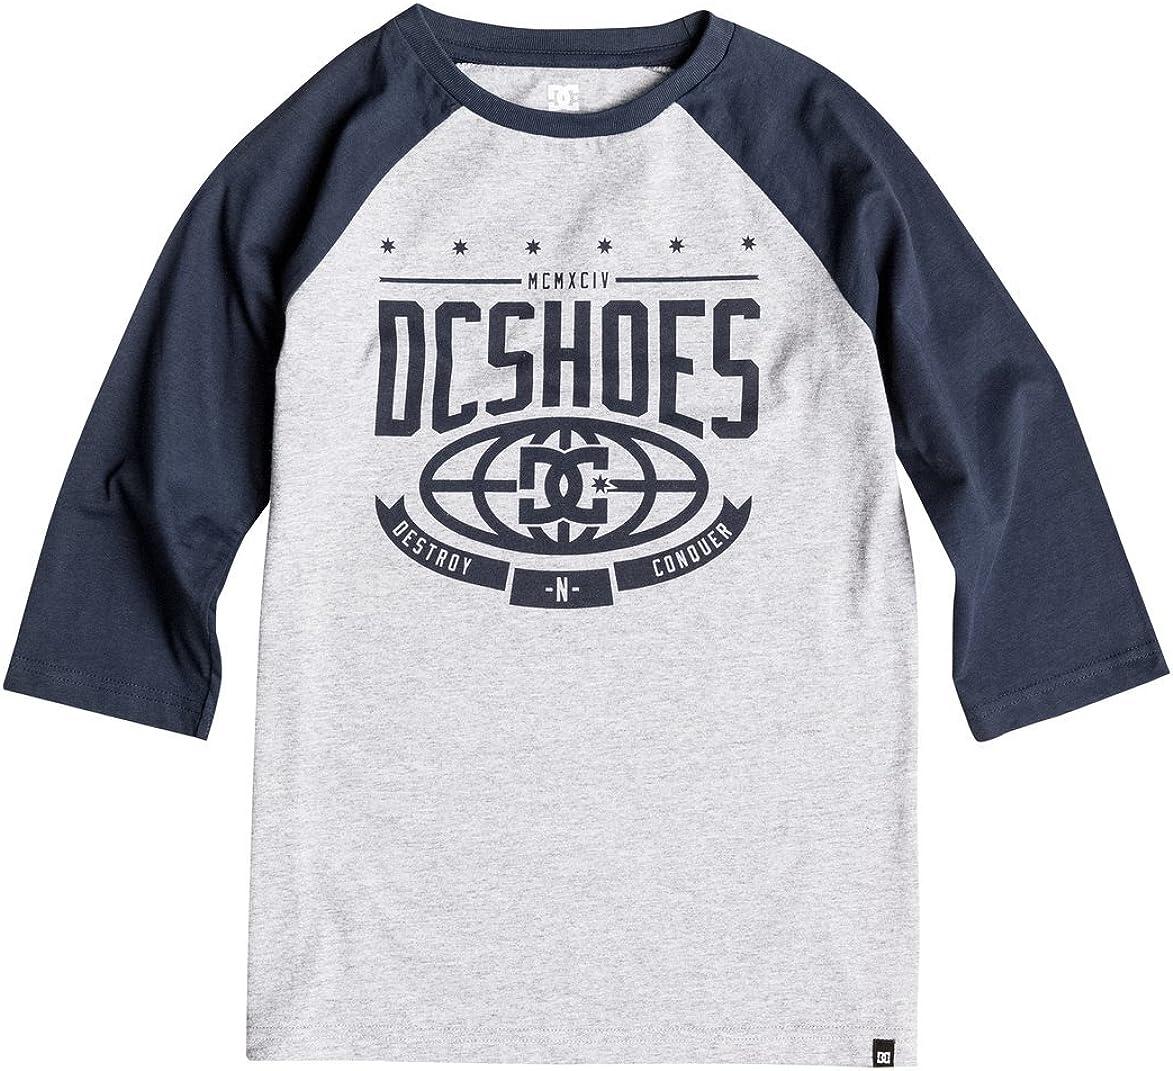 DC Shoes The Creed Rag B B Tees Btl0 Camiseta, niño, Azul ...